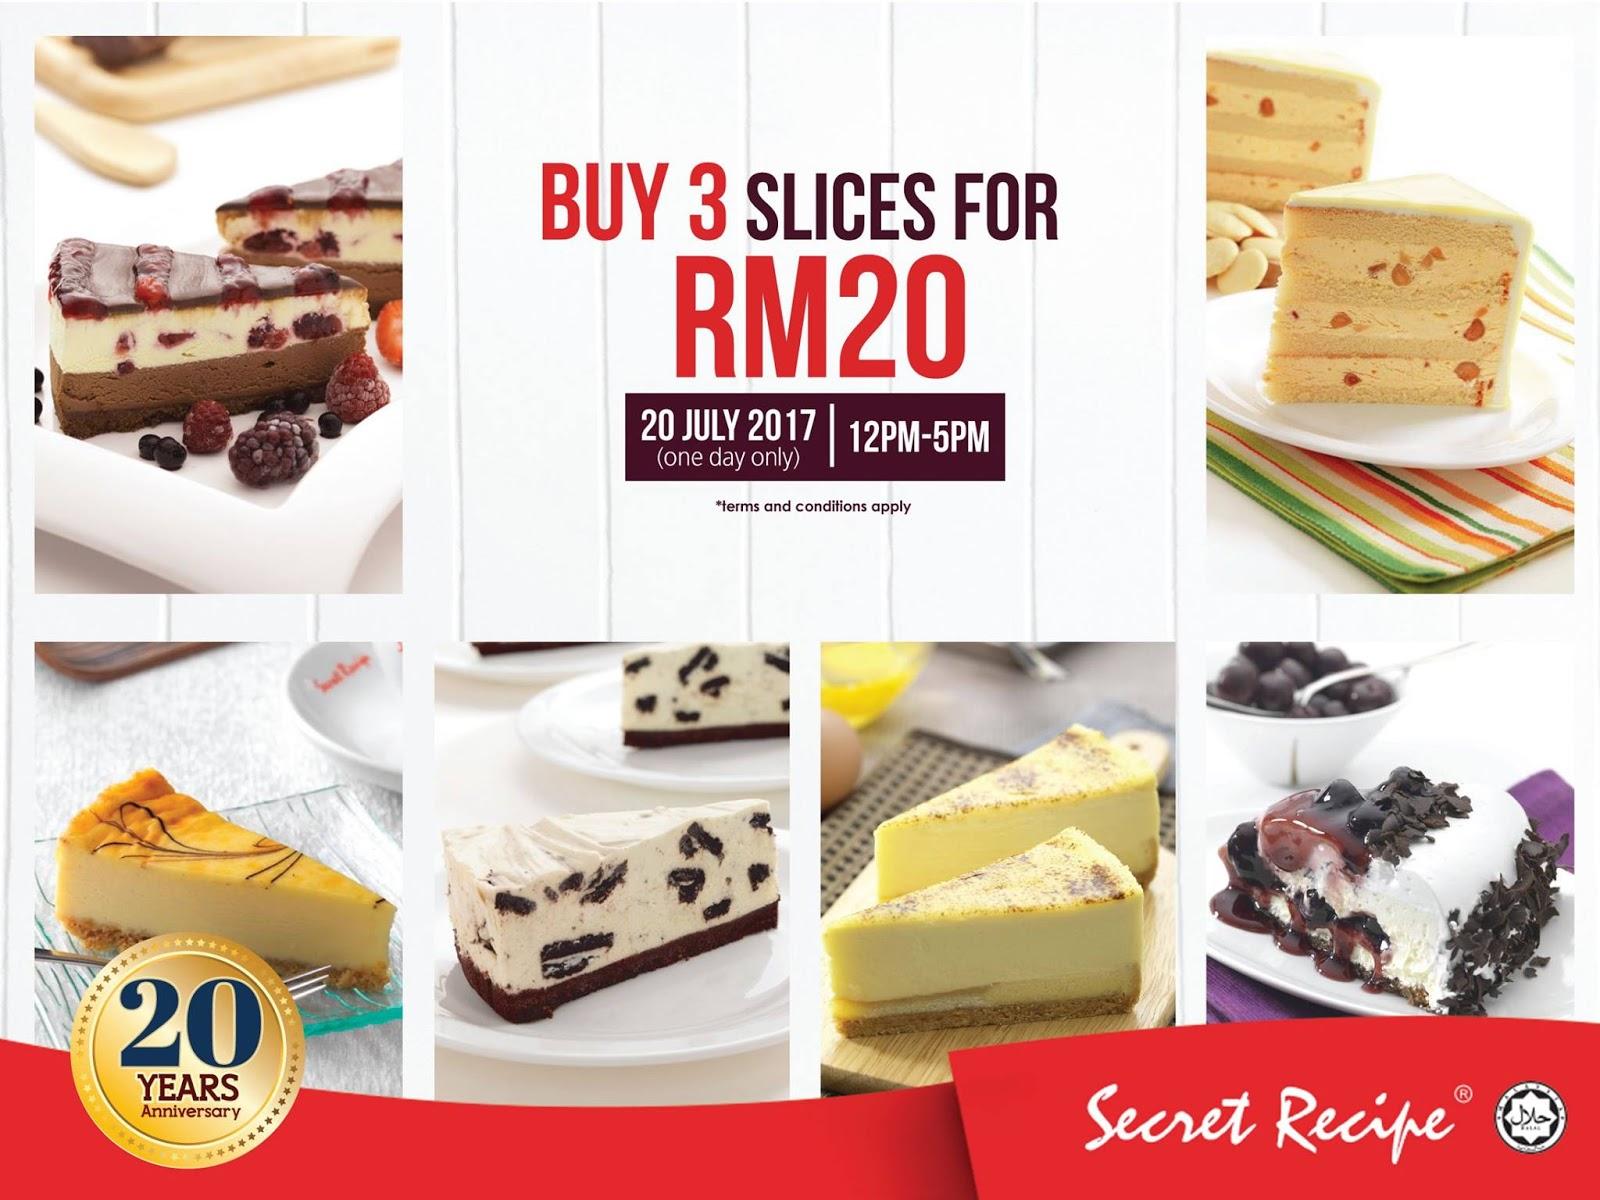 3 Slices Of Secret Recipe Cake For Rm20 Regular Range 12pm 5pm 20 July 2017